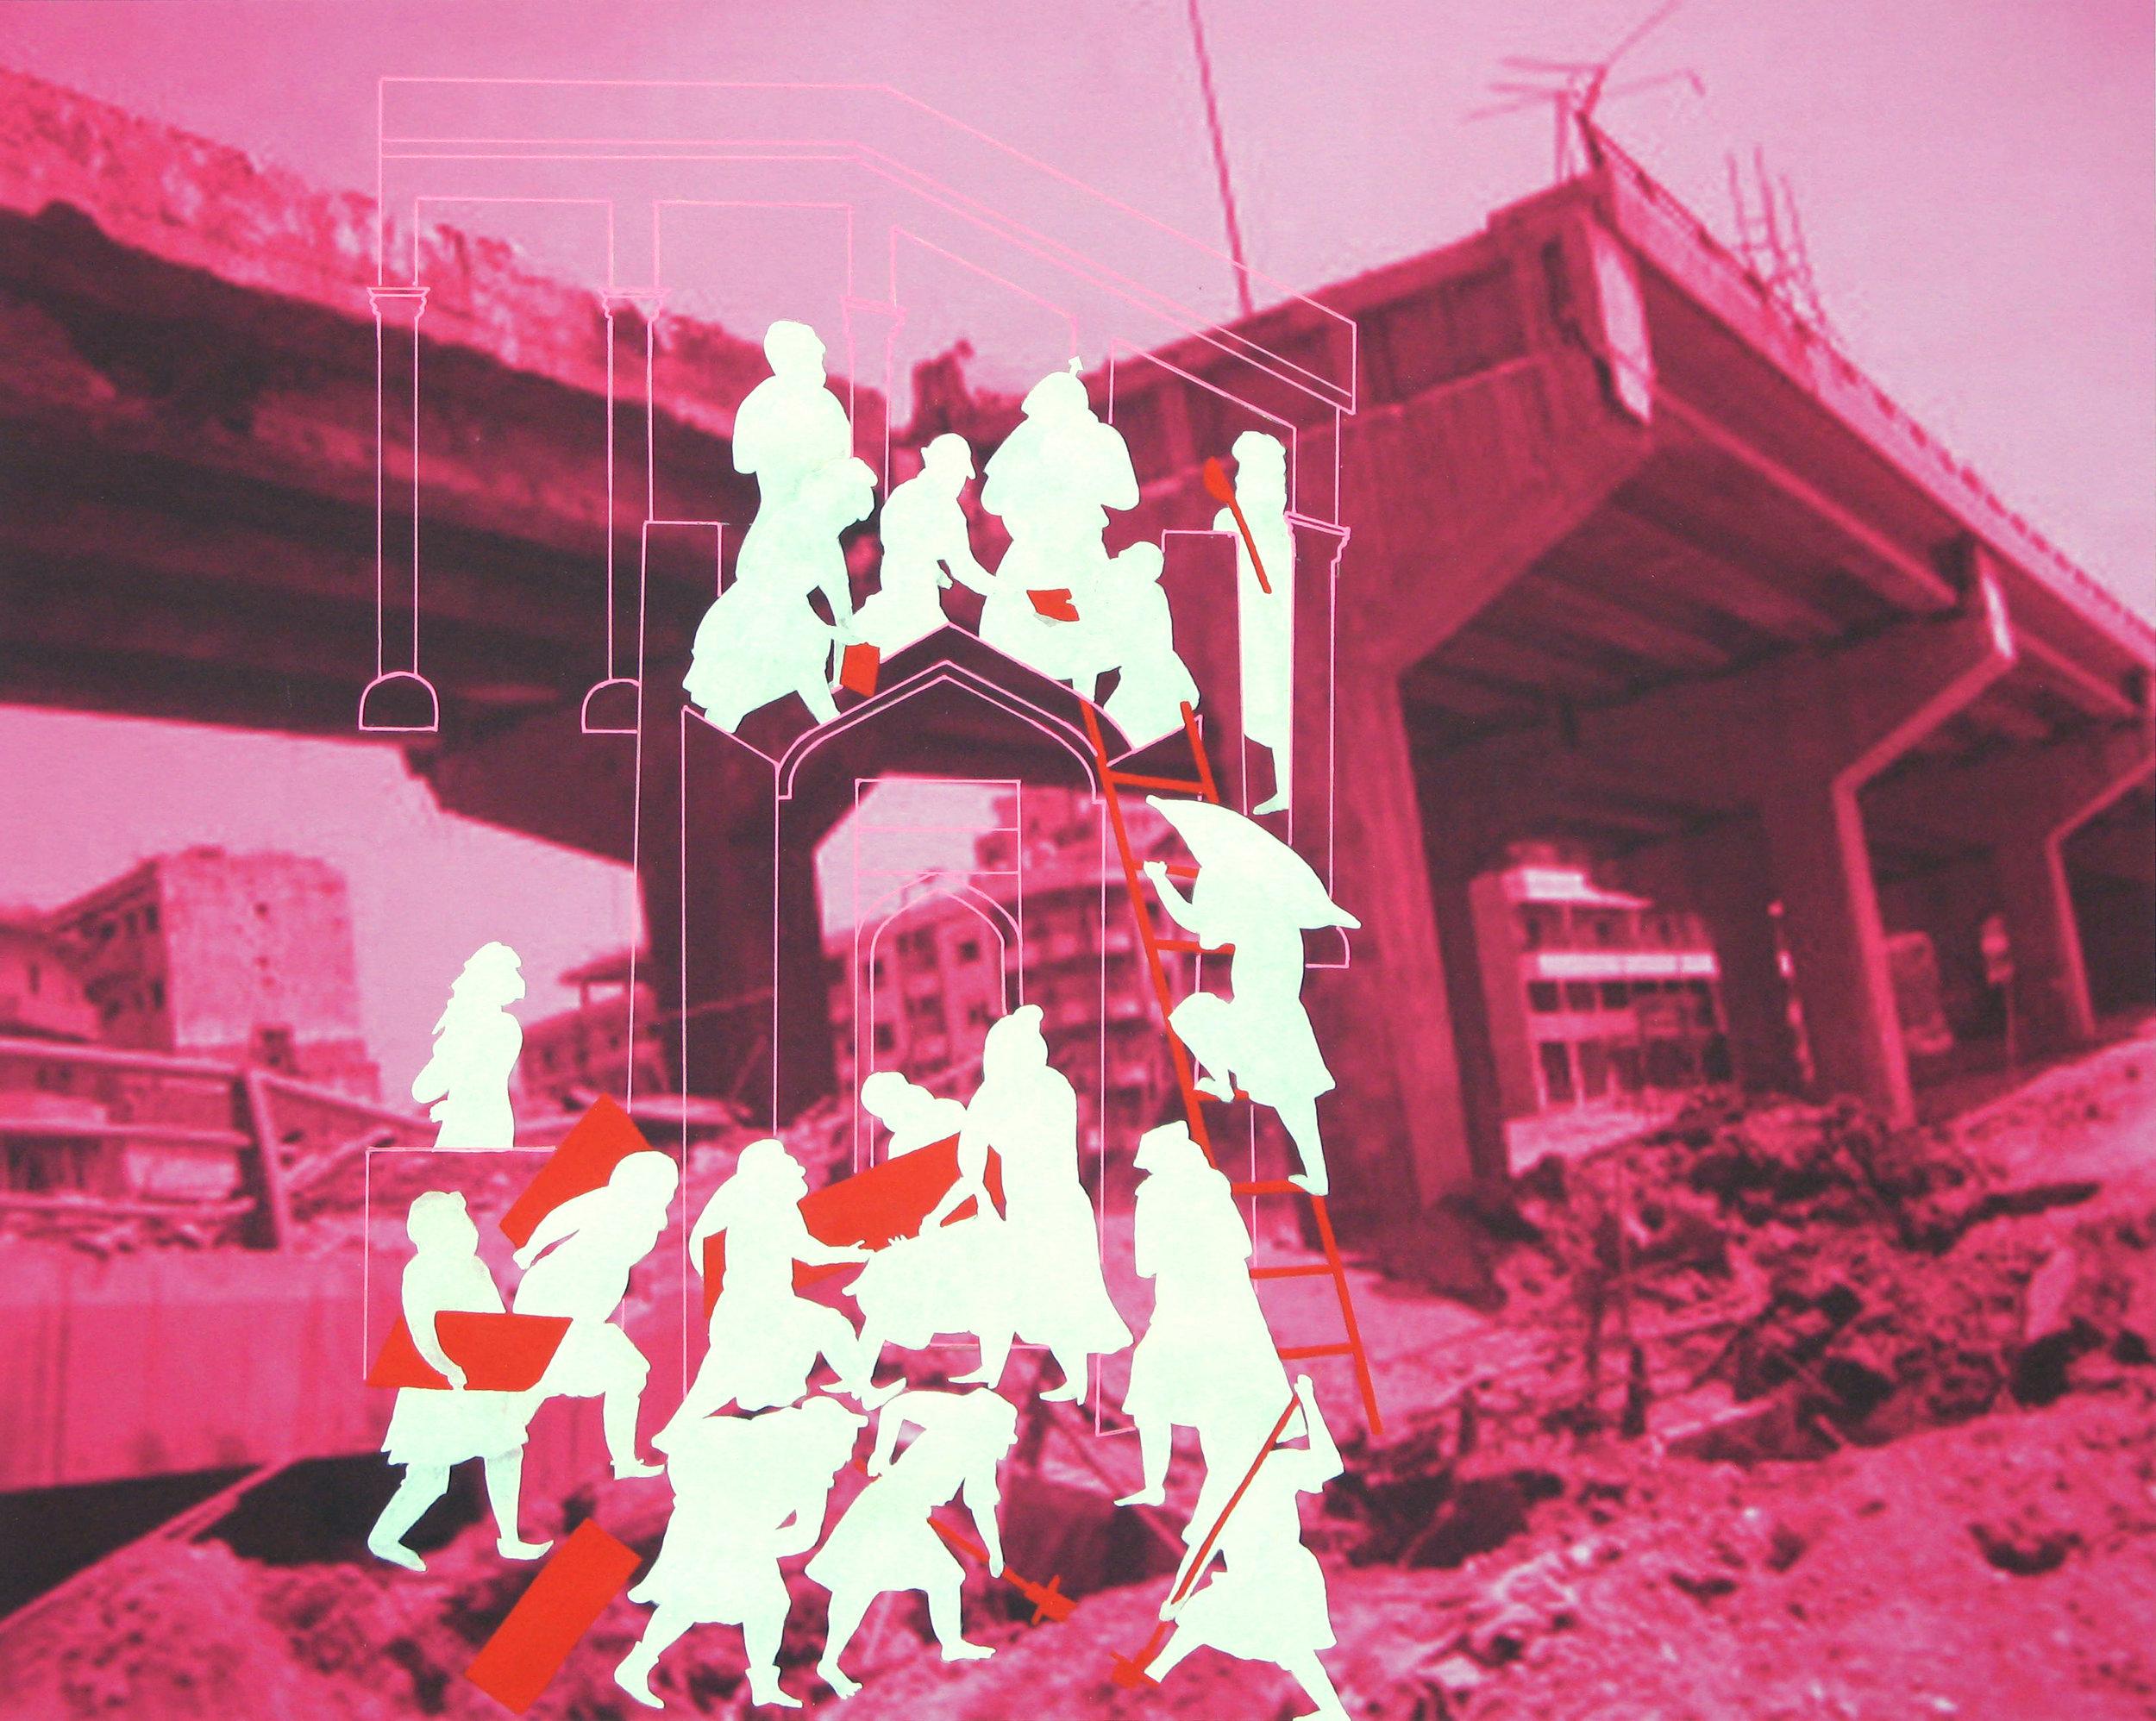 RECONSTRUCTION: MAGENTA BEIRUT, 2007